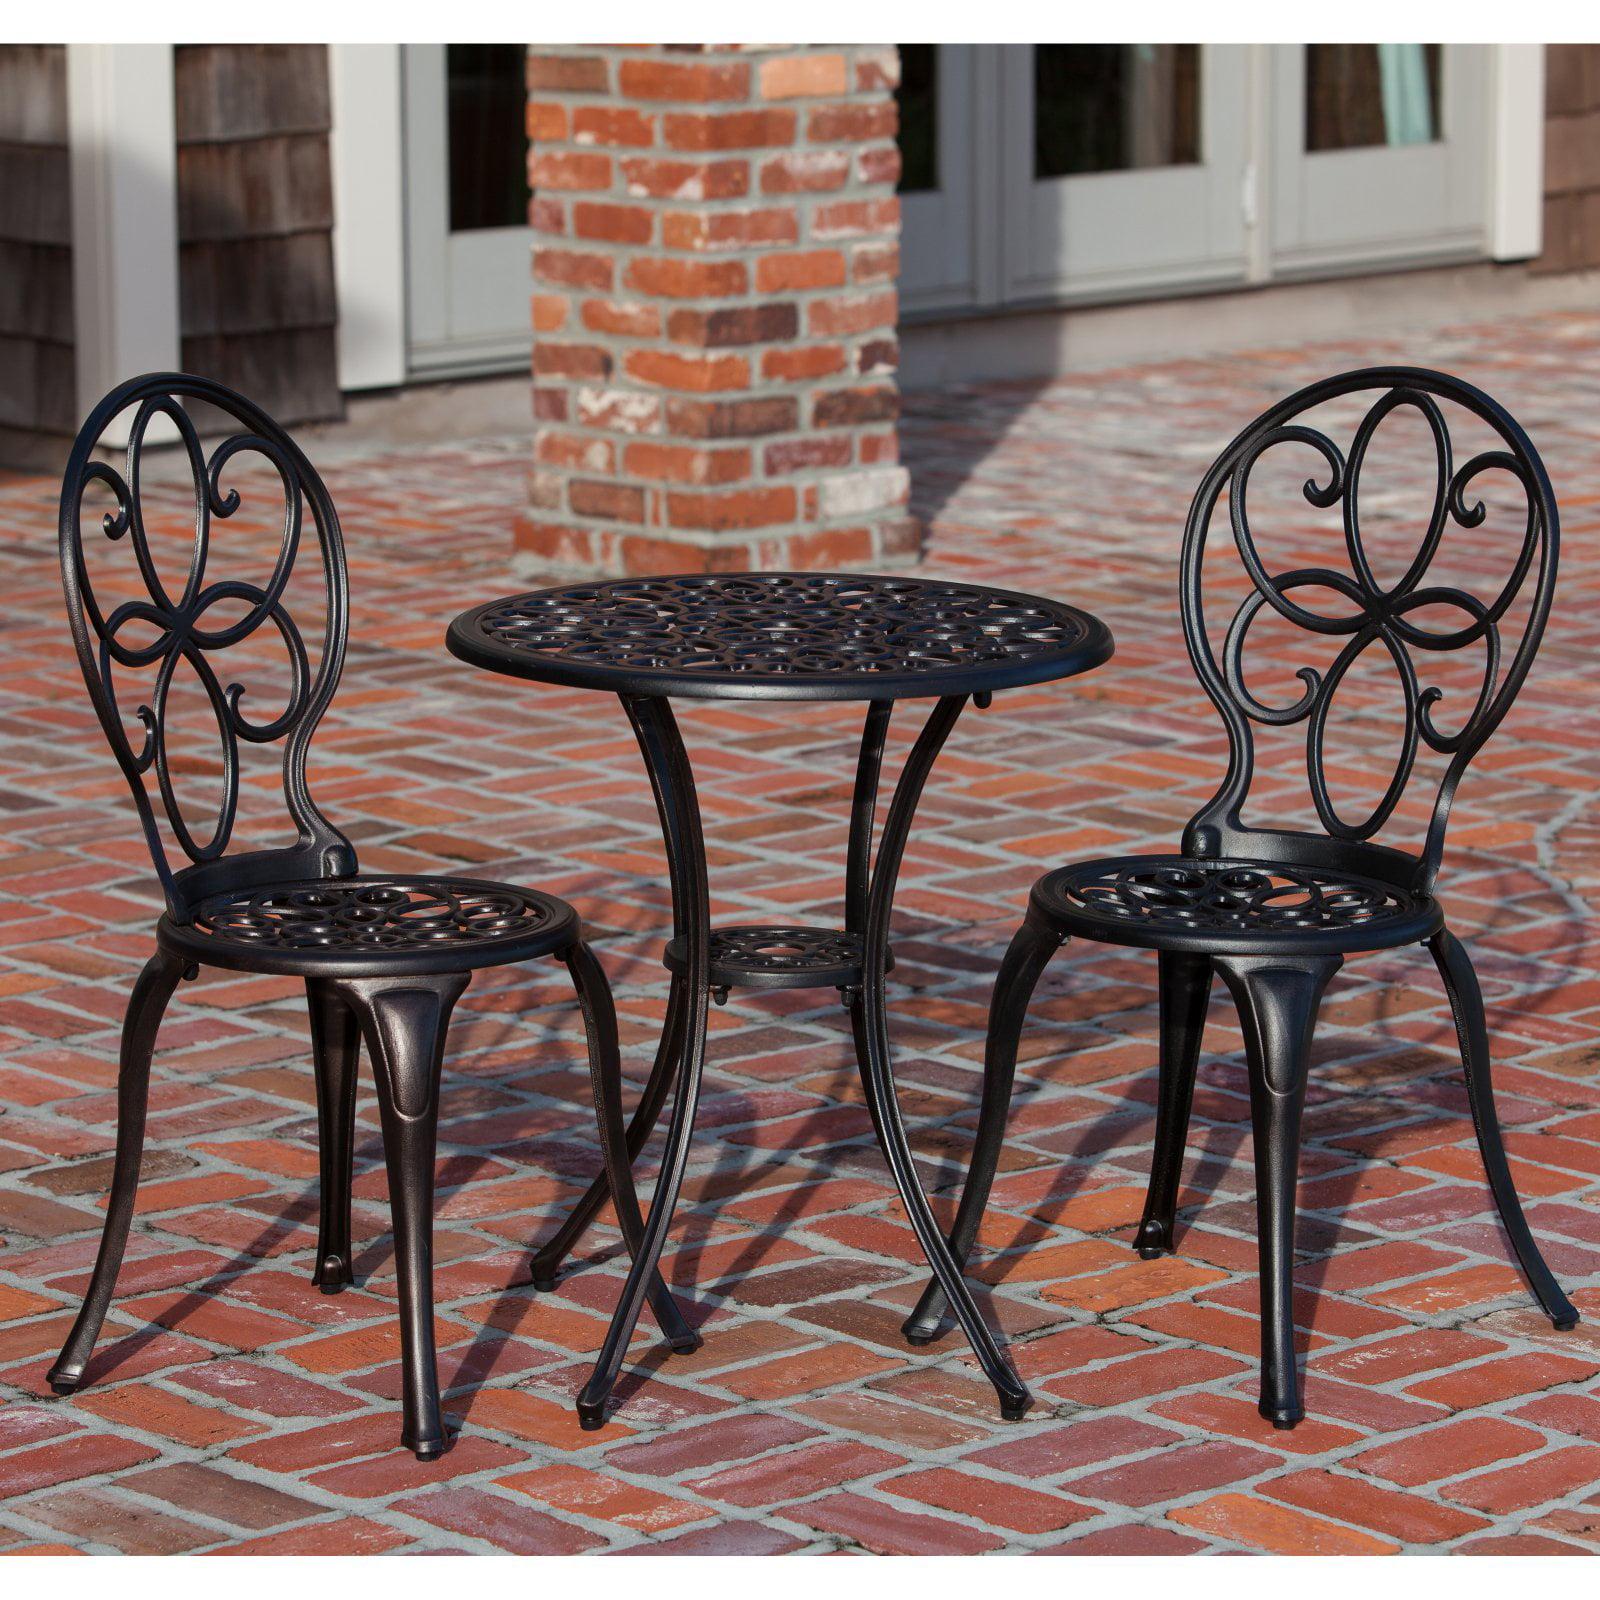 Patio Sense Antique Bronze Cast Aluminum 3-Piece Outdoor Bistro Set